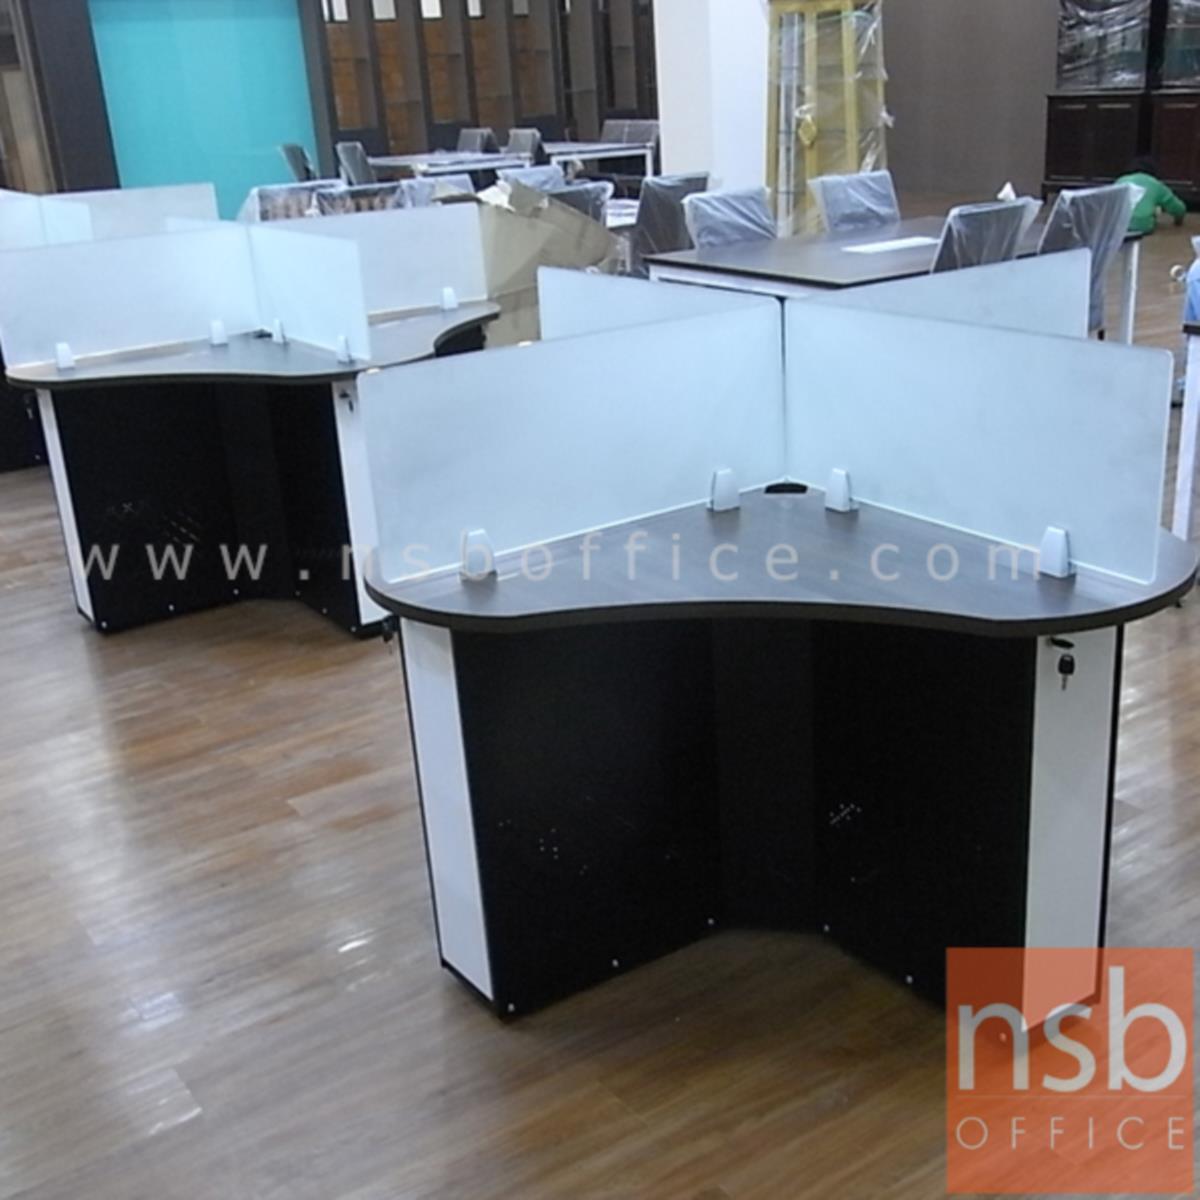 A04A162:ชุดโต๊ะทำงานกลุ่ม 4 ที่นั่ง   ขนาด 150W ,180W cm. พร้อม miniscreen กระจก